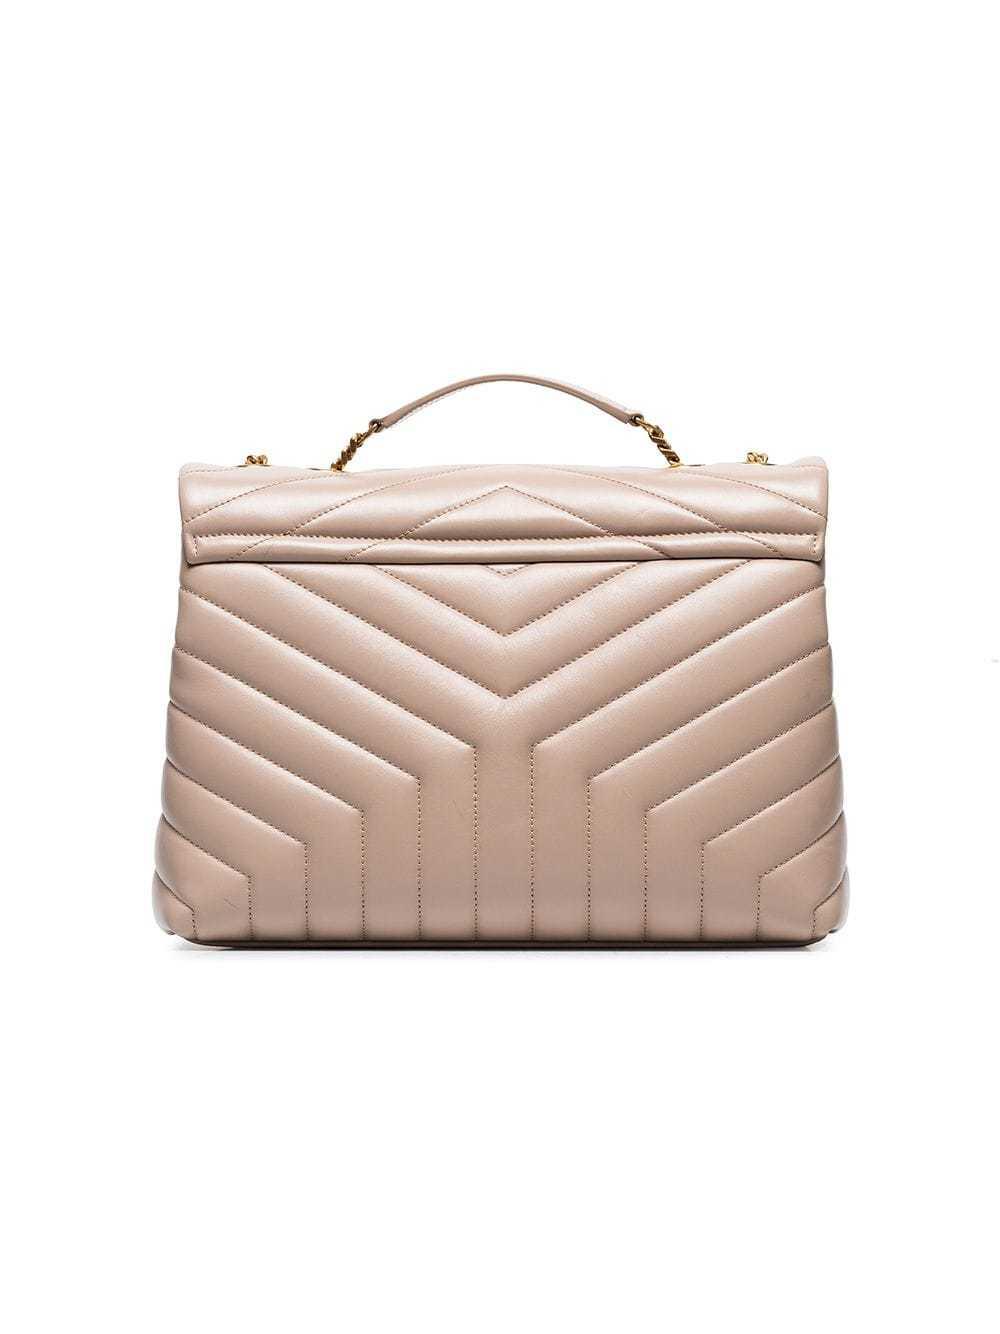 96cbe388eb Saint Laurent Nude Lou Lou Medium Quilted Leather Shoulder Bag ...